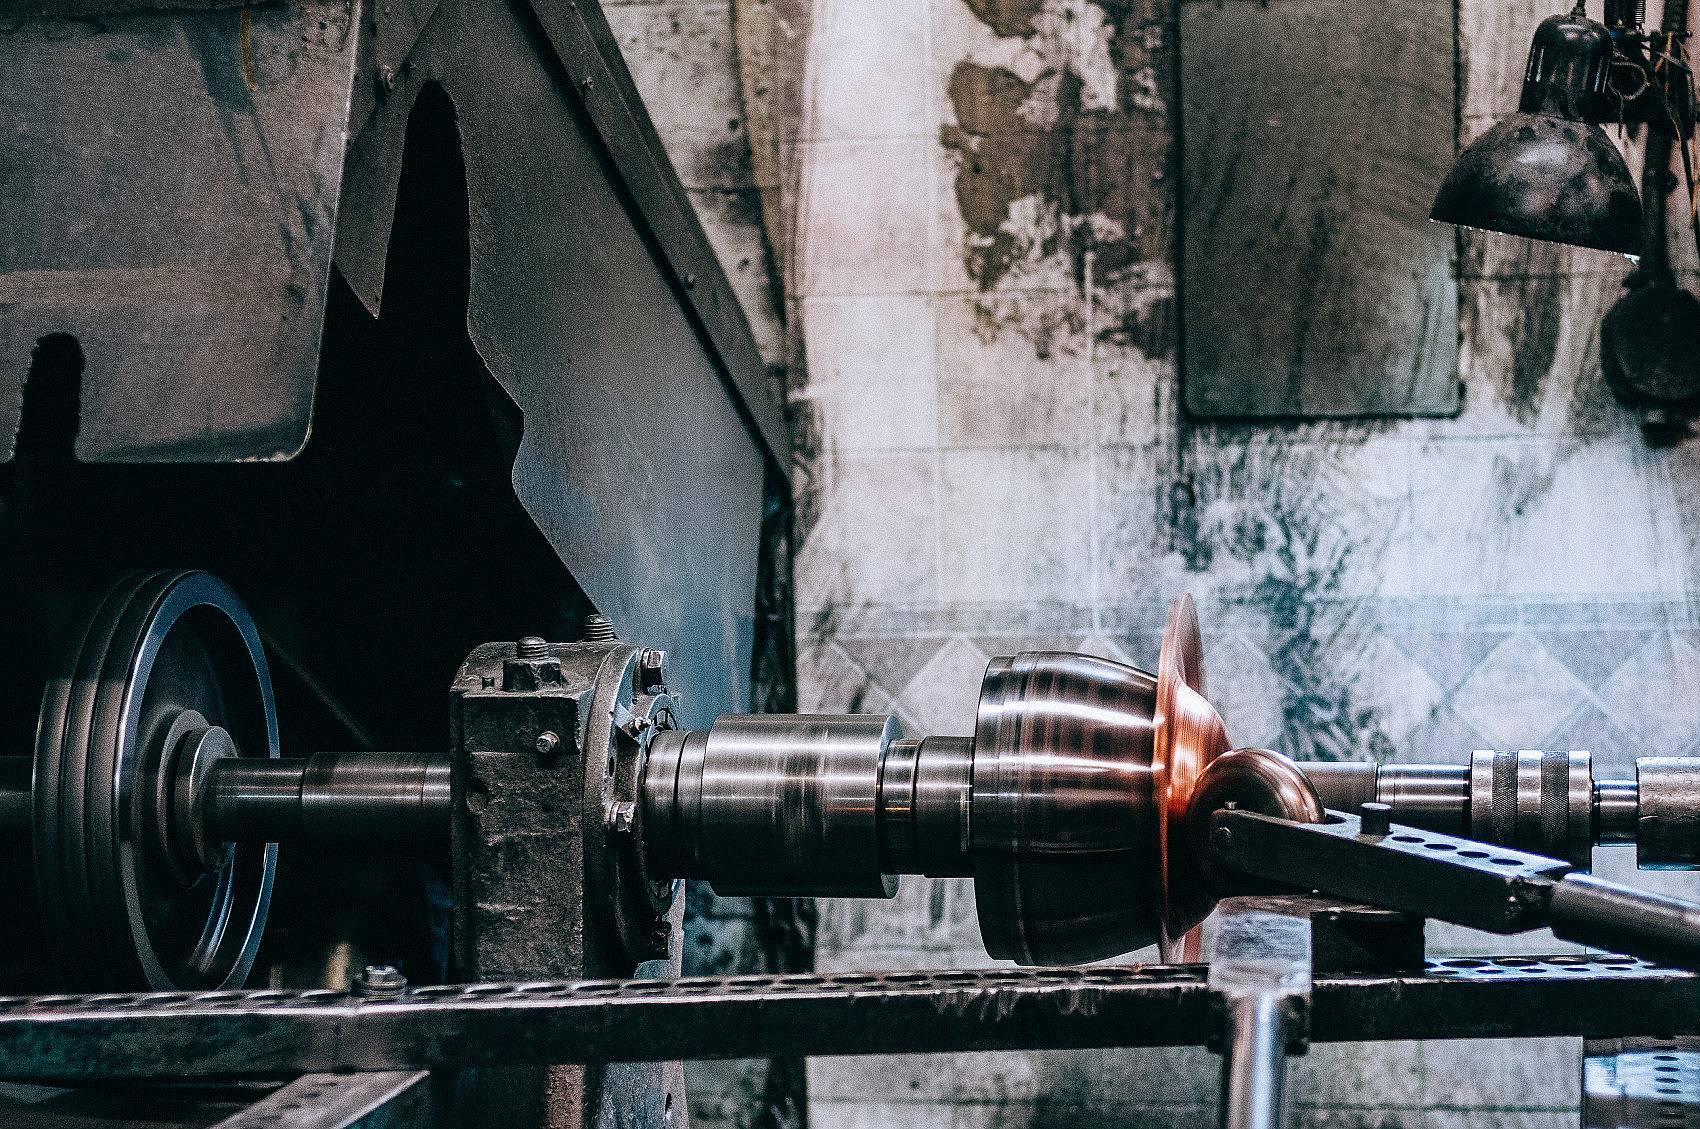 Copper Bullet Bowl being hand spun at Ben Barber's local metal spinning shop